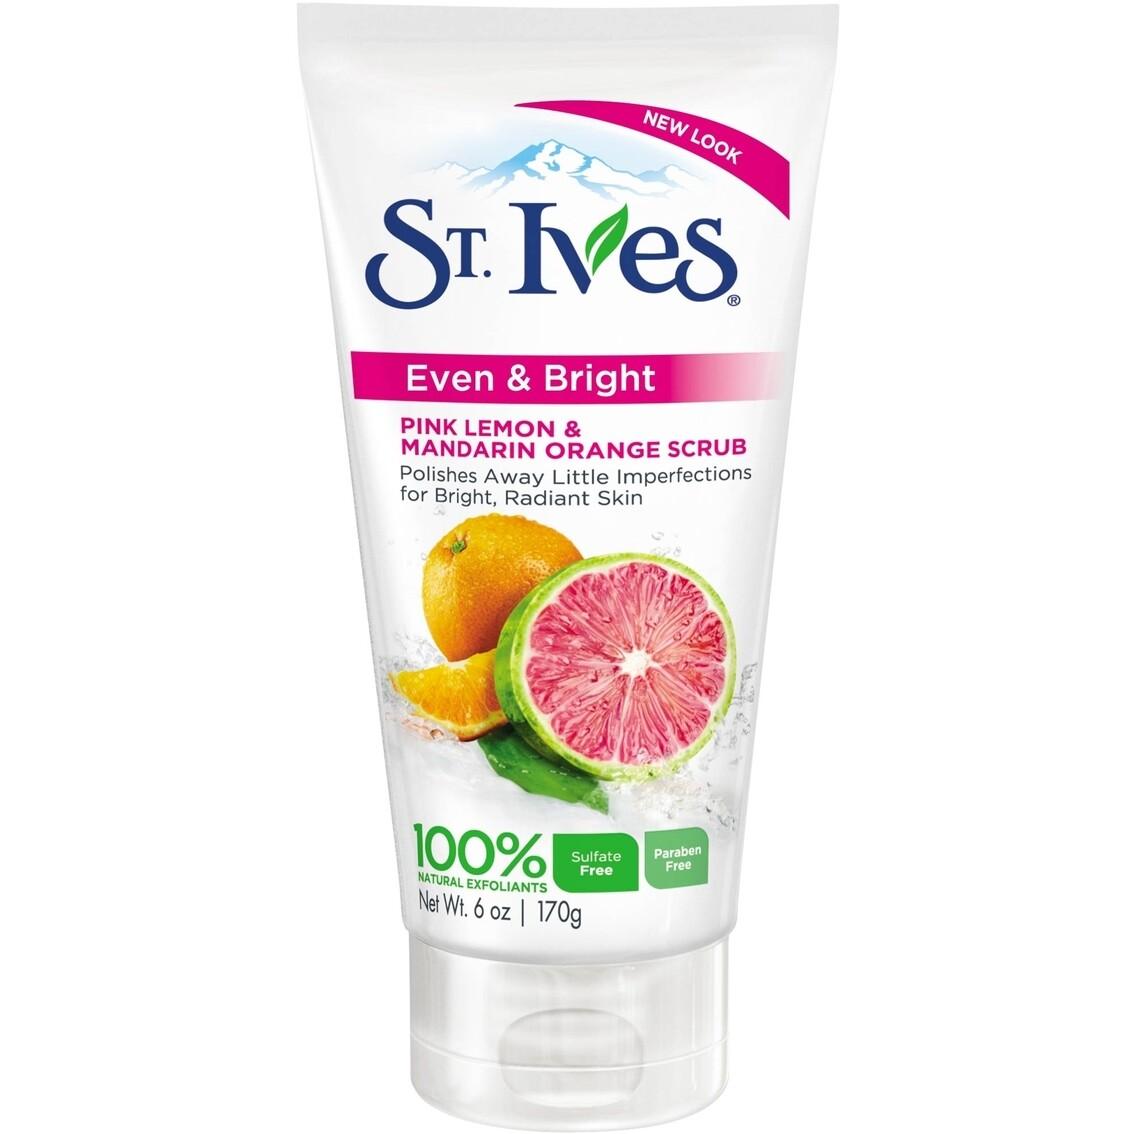 St. Ives Scrub